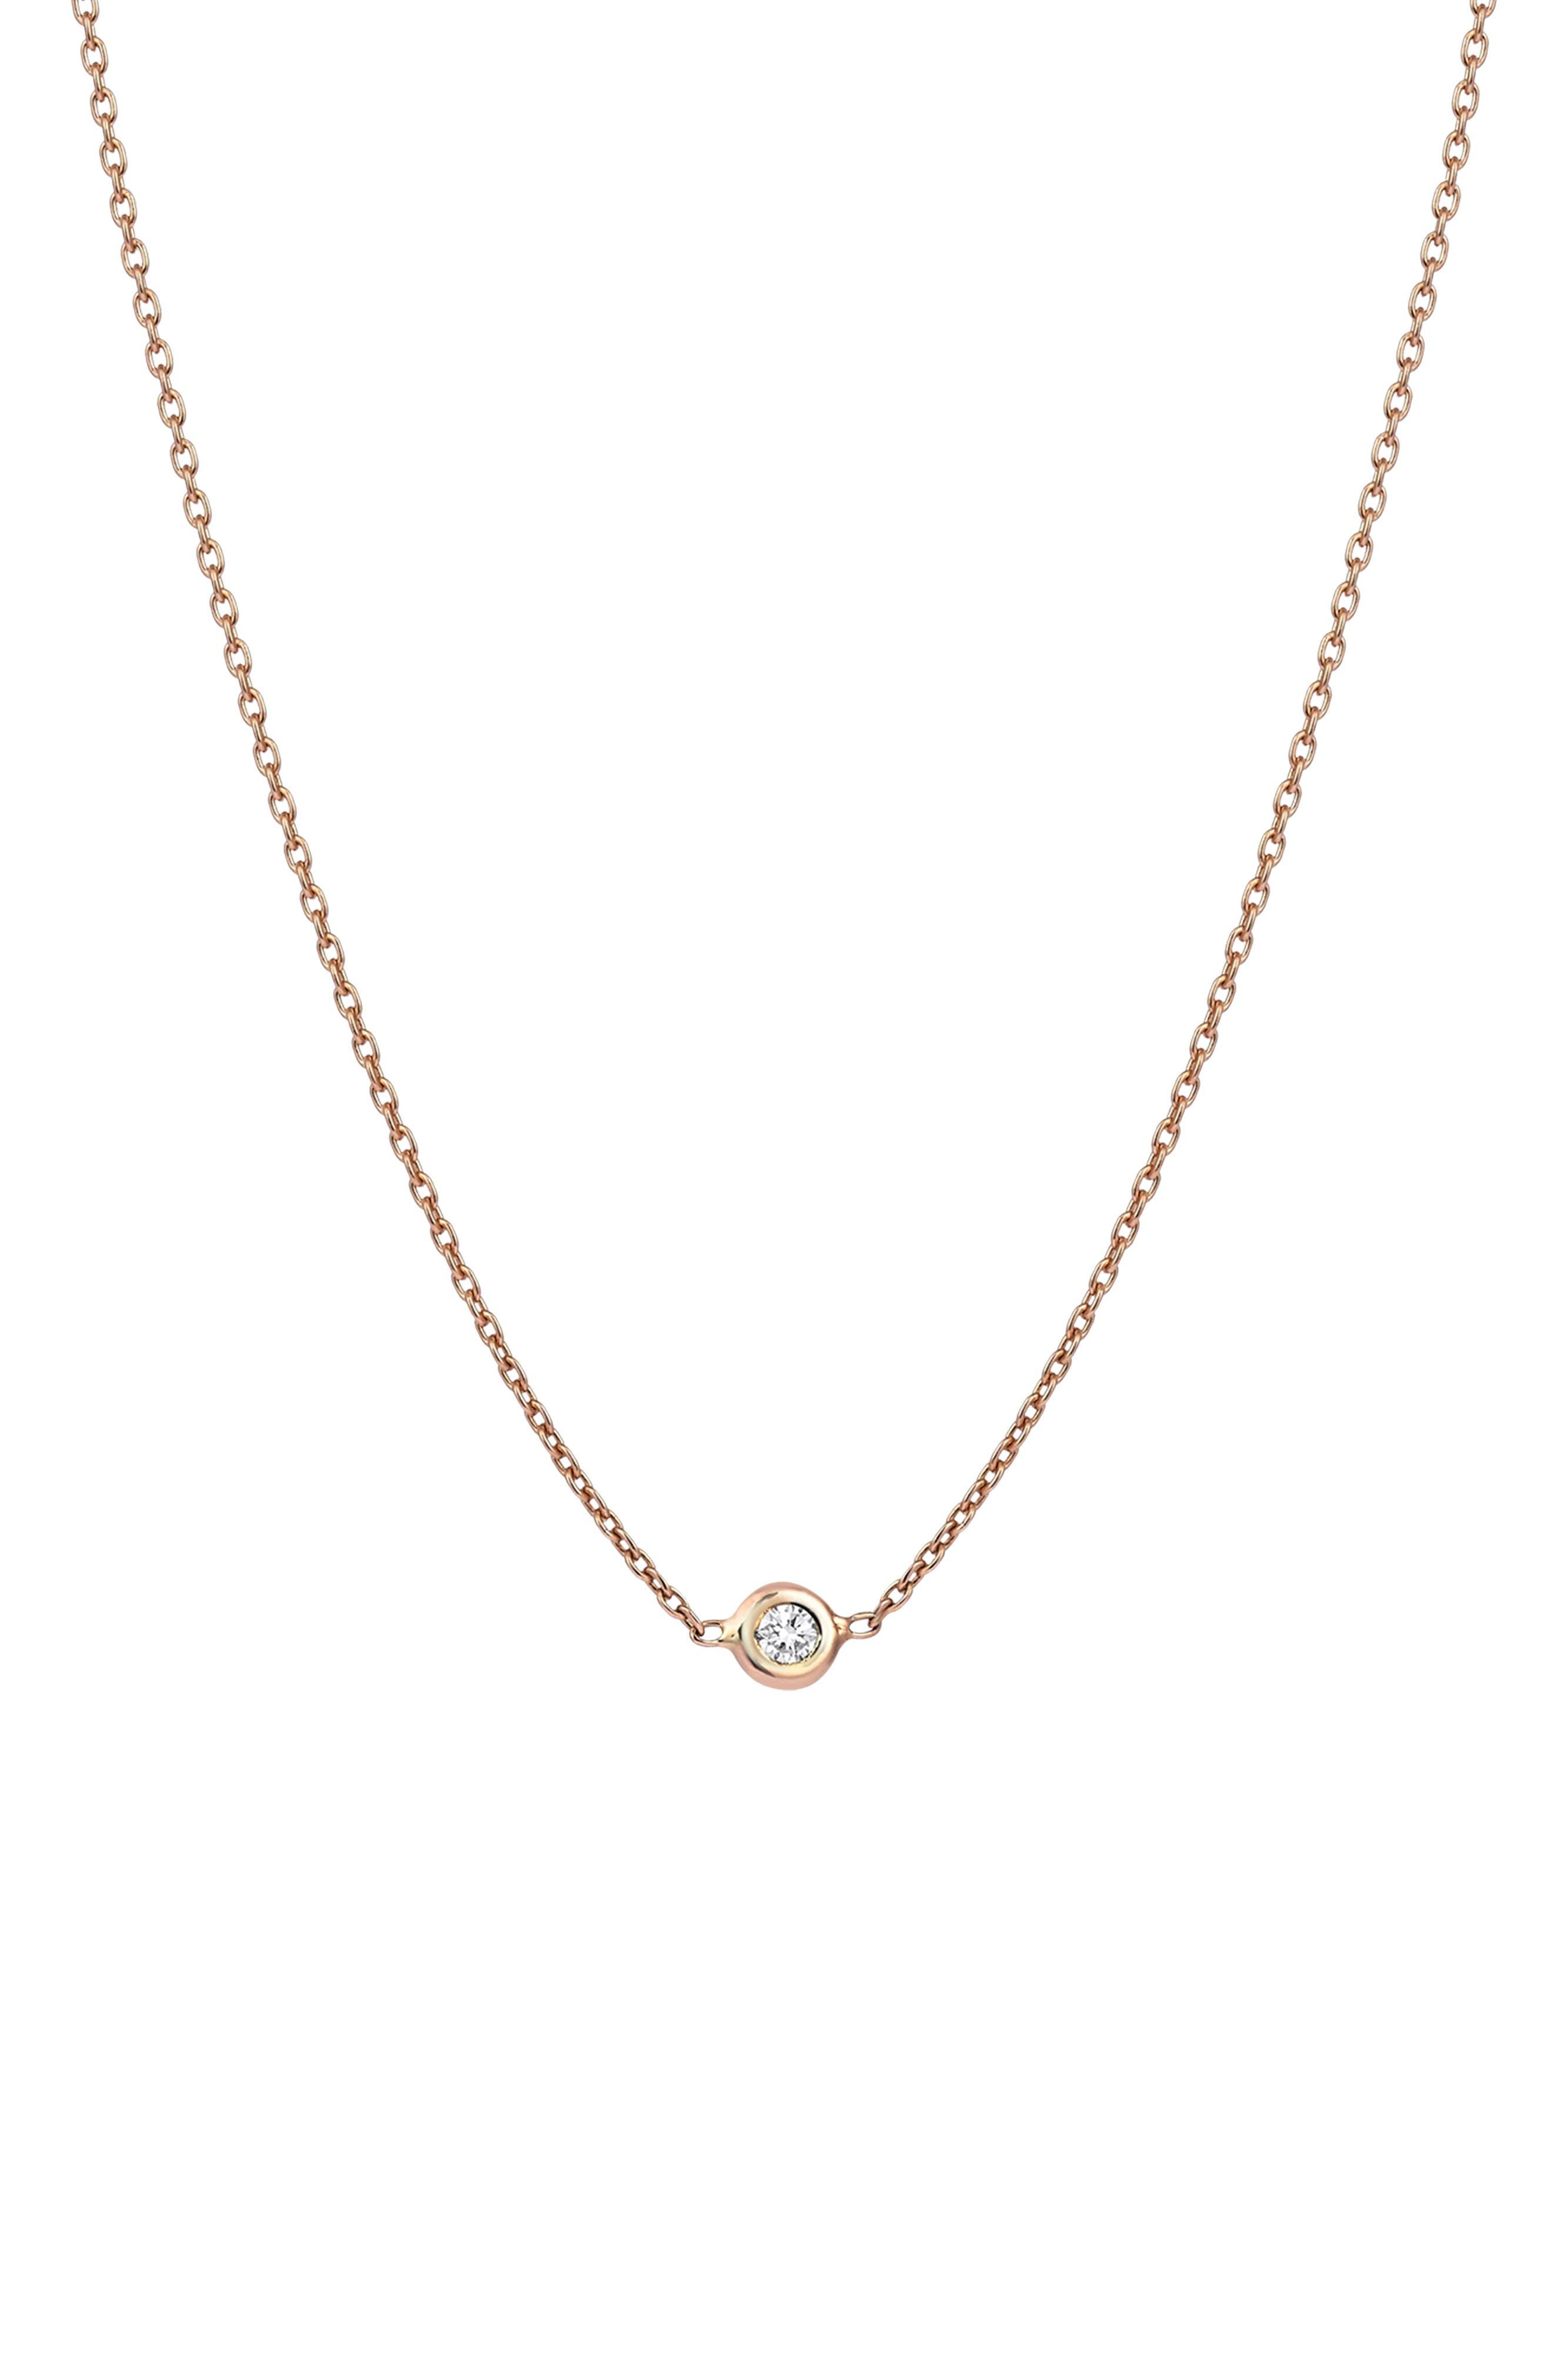 KISMET BY MILKA, Diamond Choker Necklace, Main thumbnail 1, color, ROSE GOLD